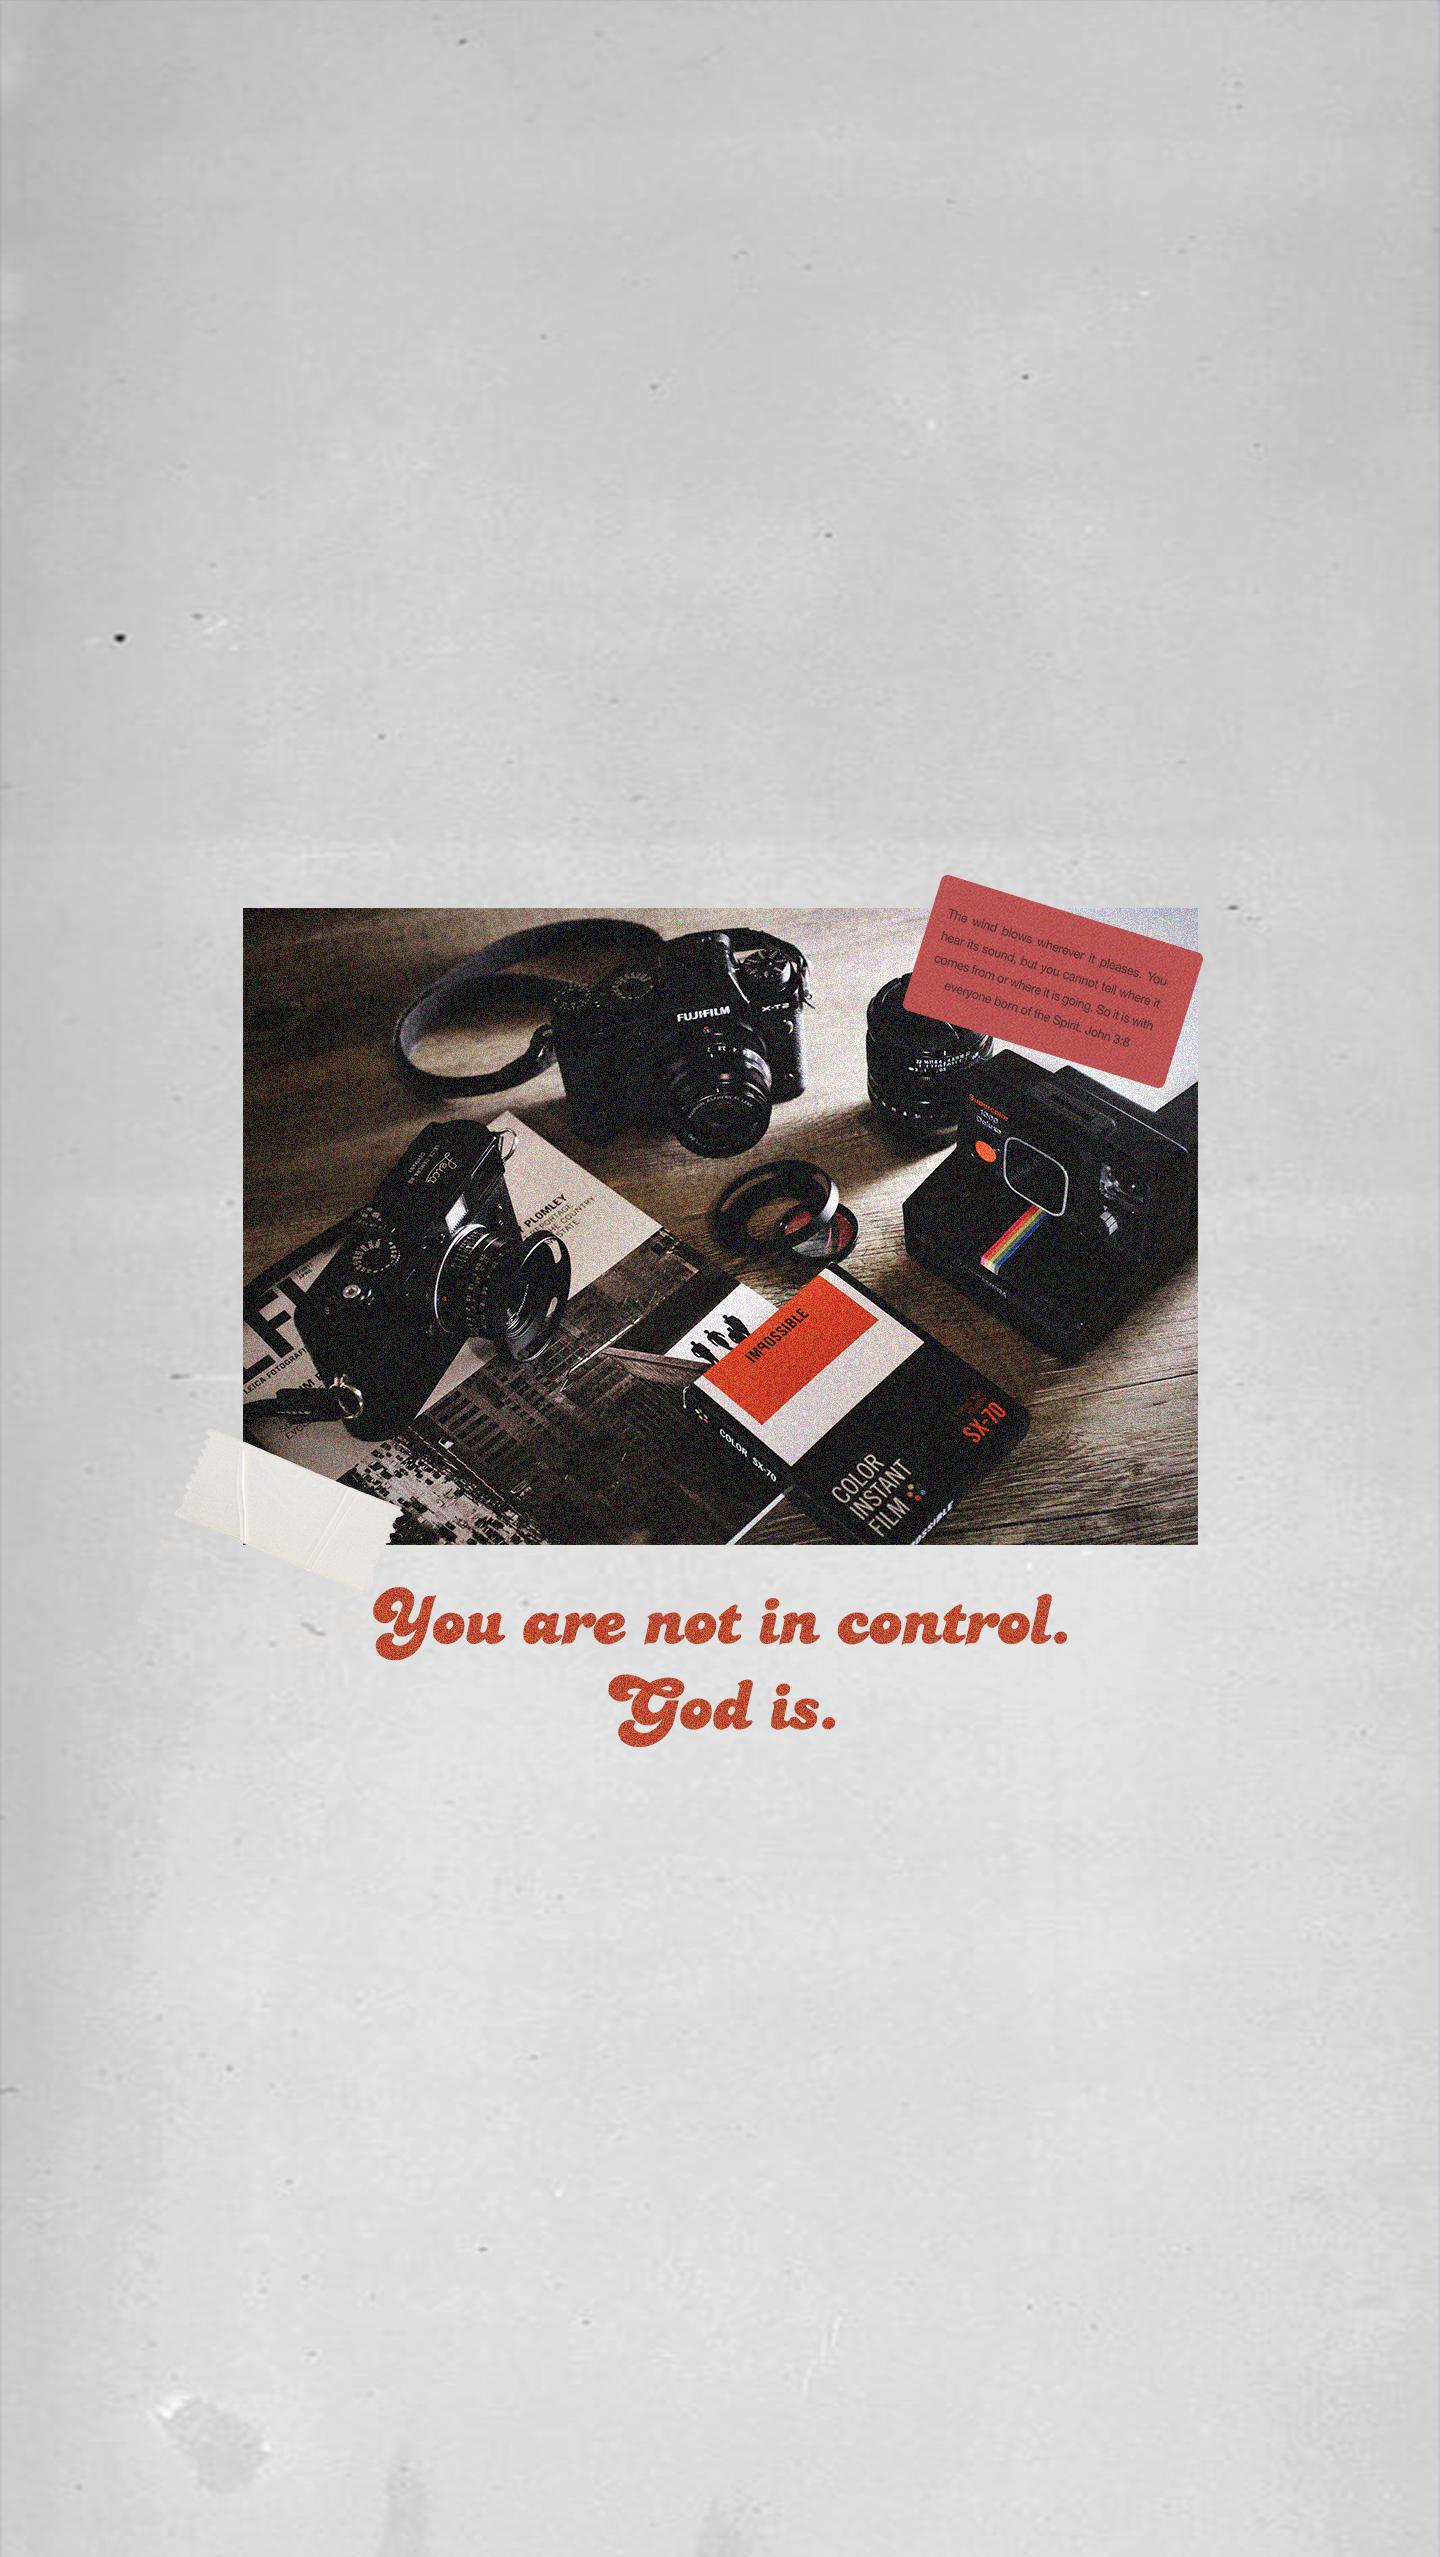 control_wallpaper_LQ.jpg